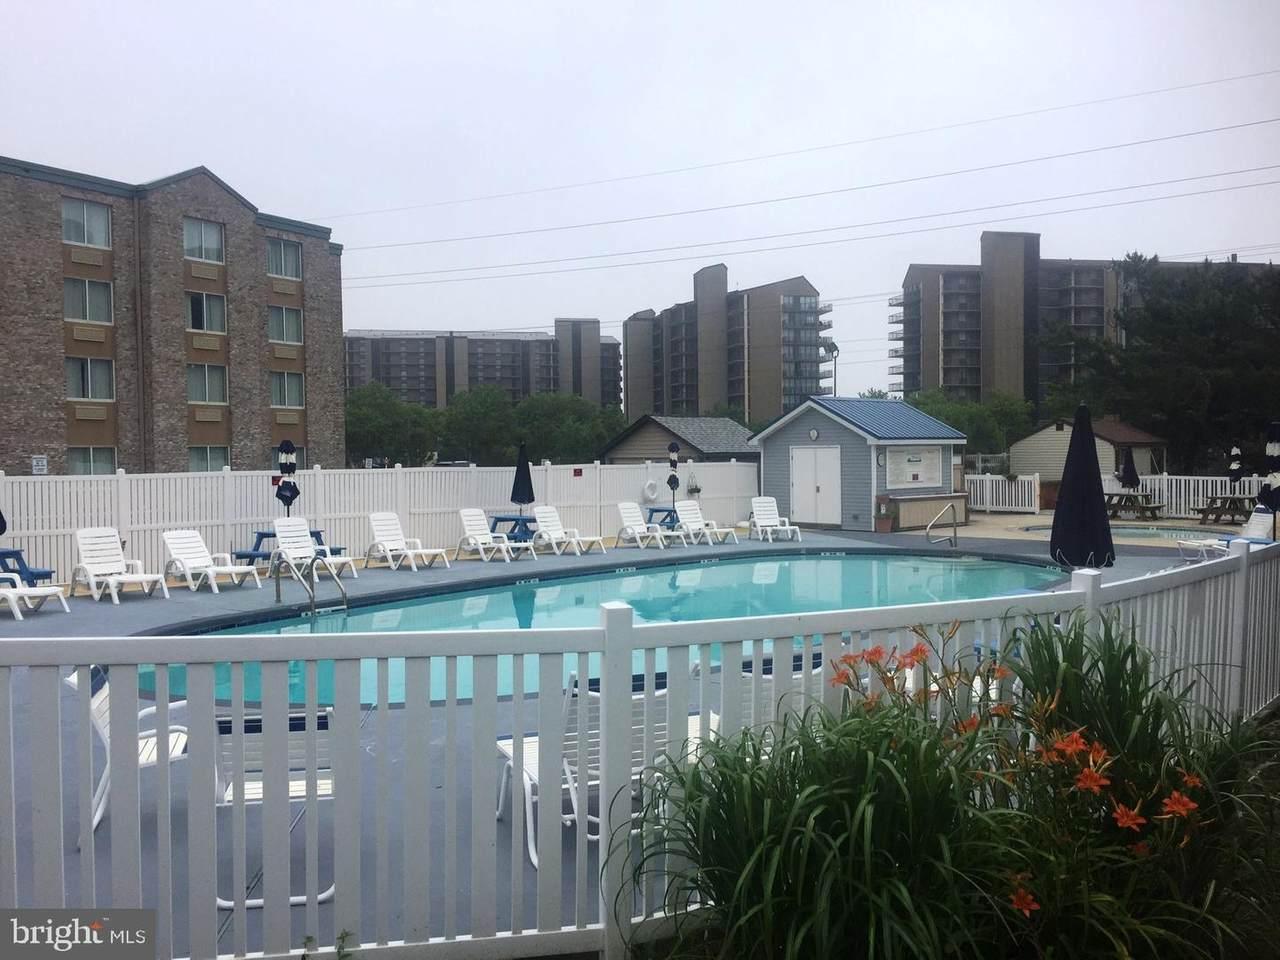 39833 U26 Wk 46 Summer Place Court - Photo 1